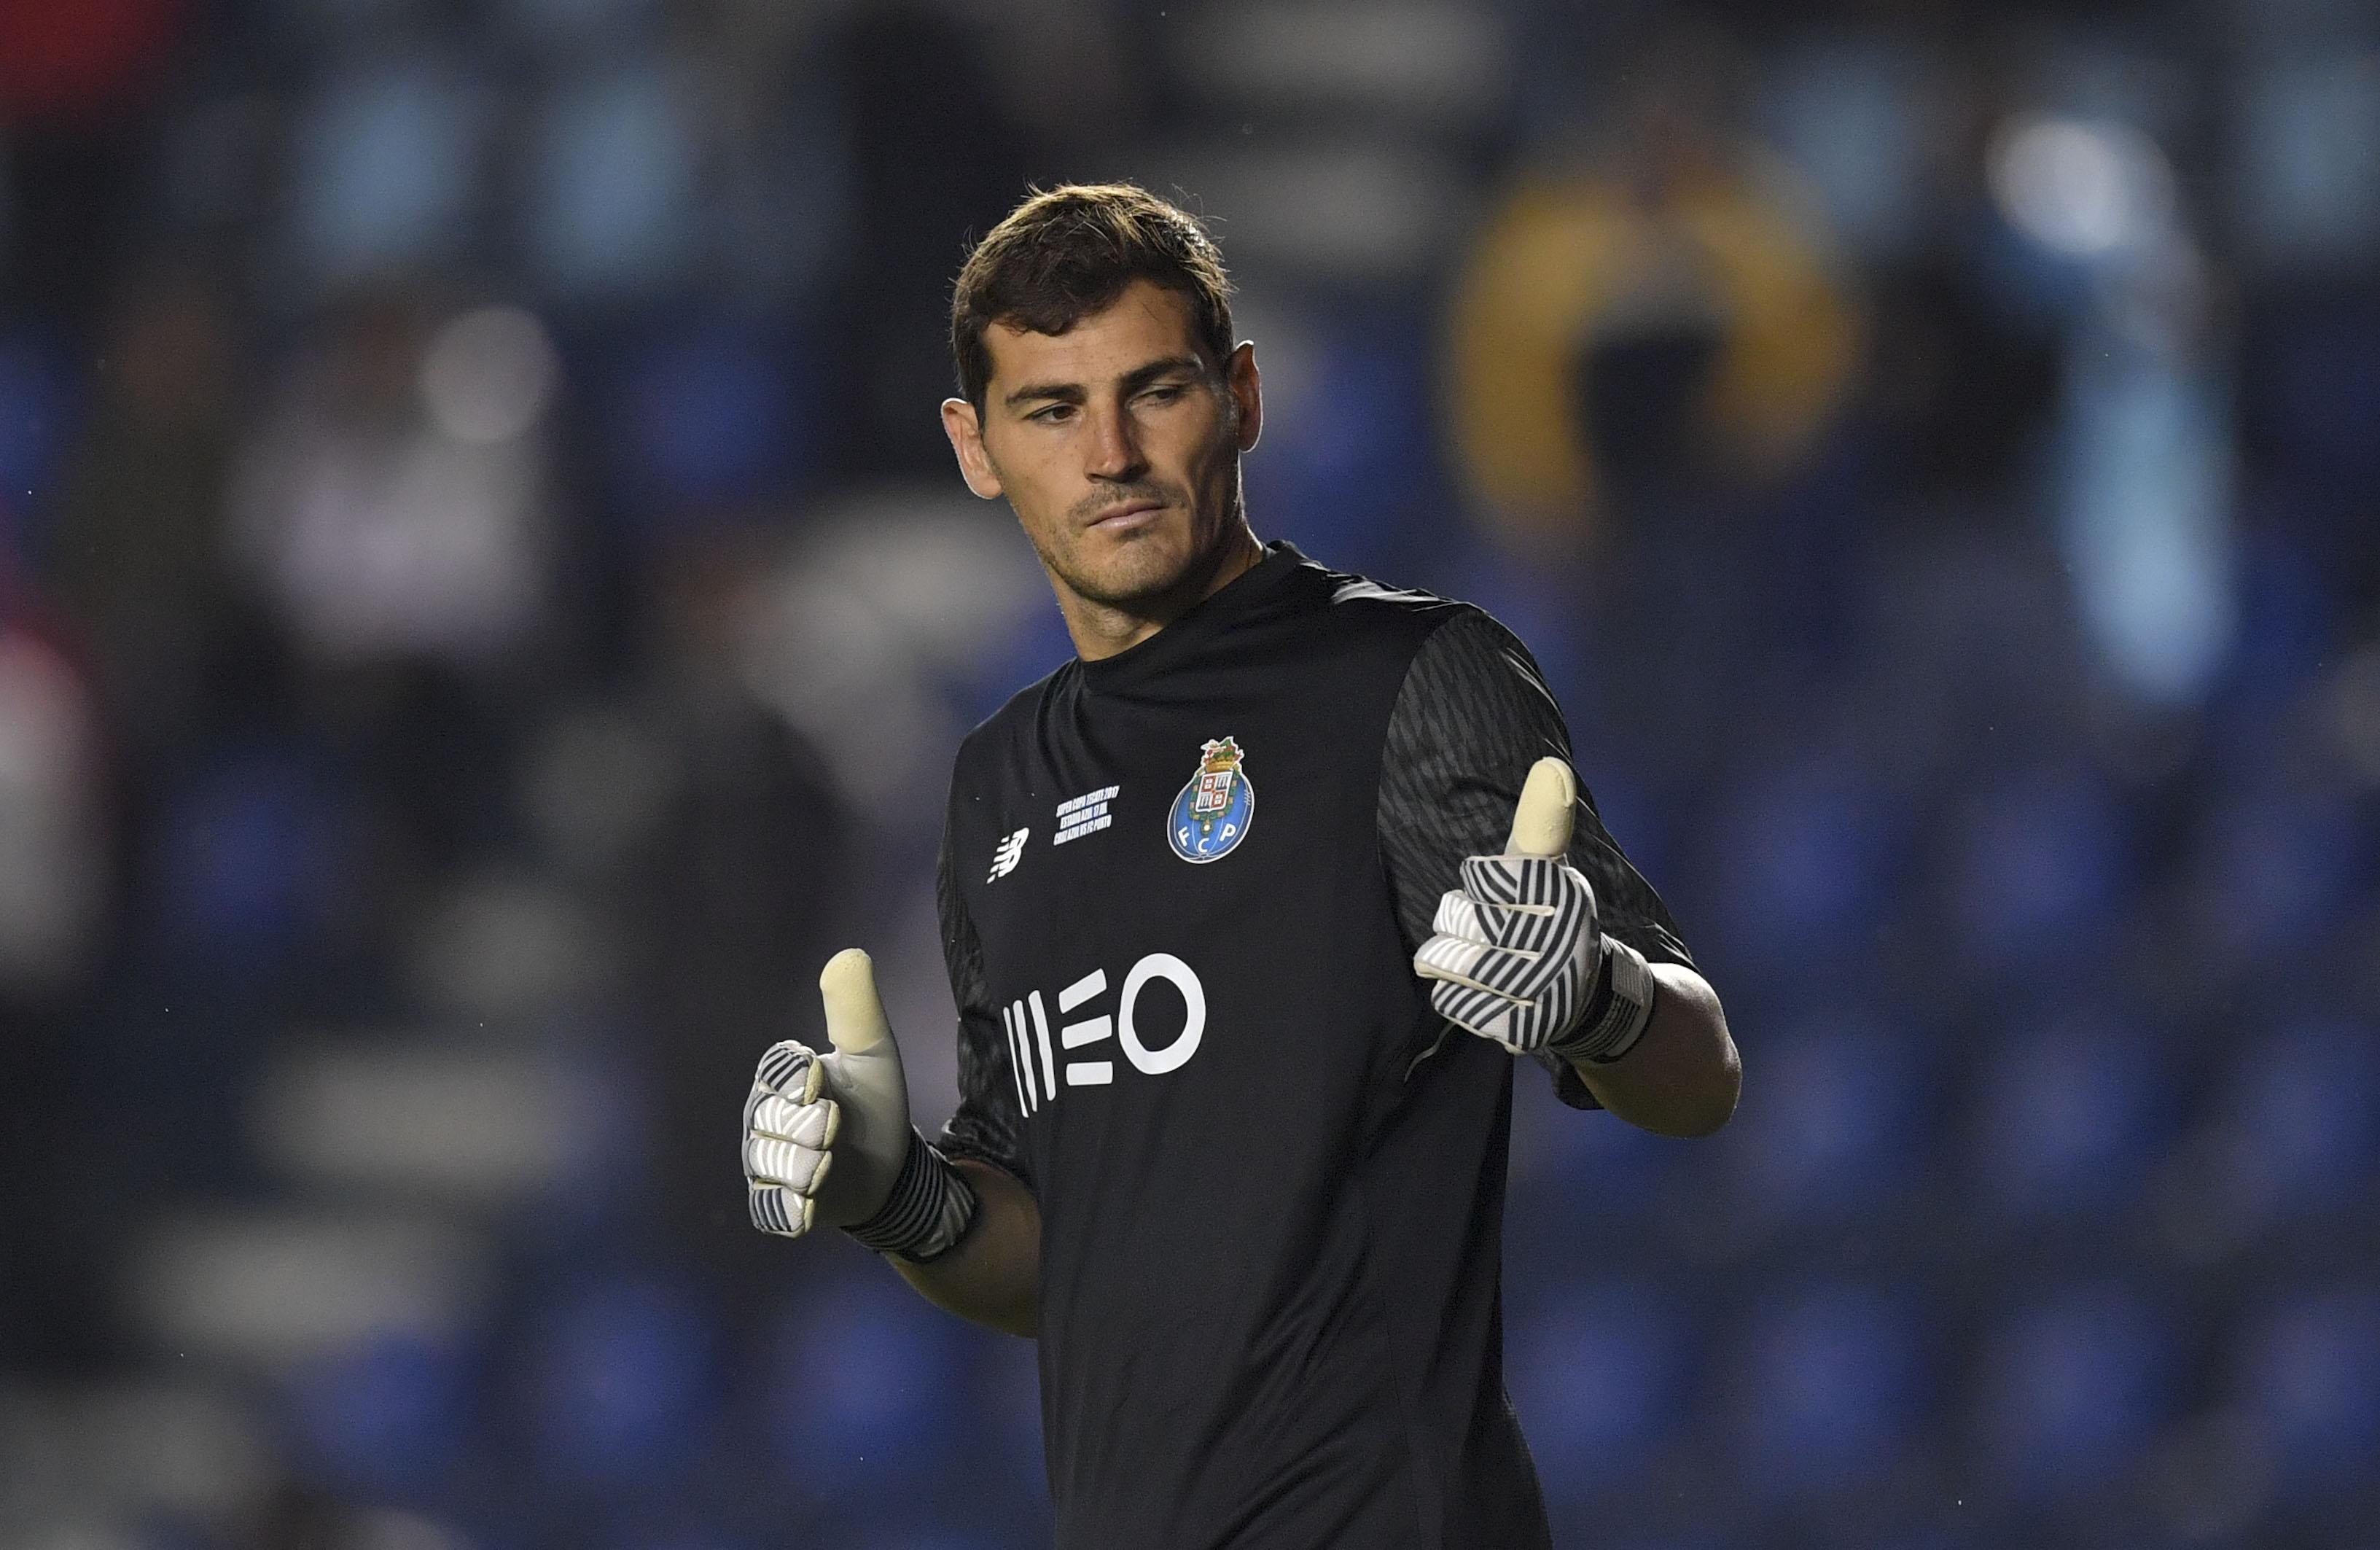 Héctor Herrera da asistencia en derrota de Porto contra Leipzig